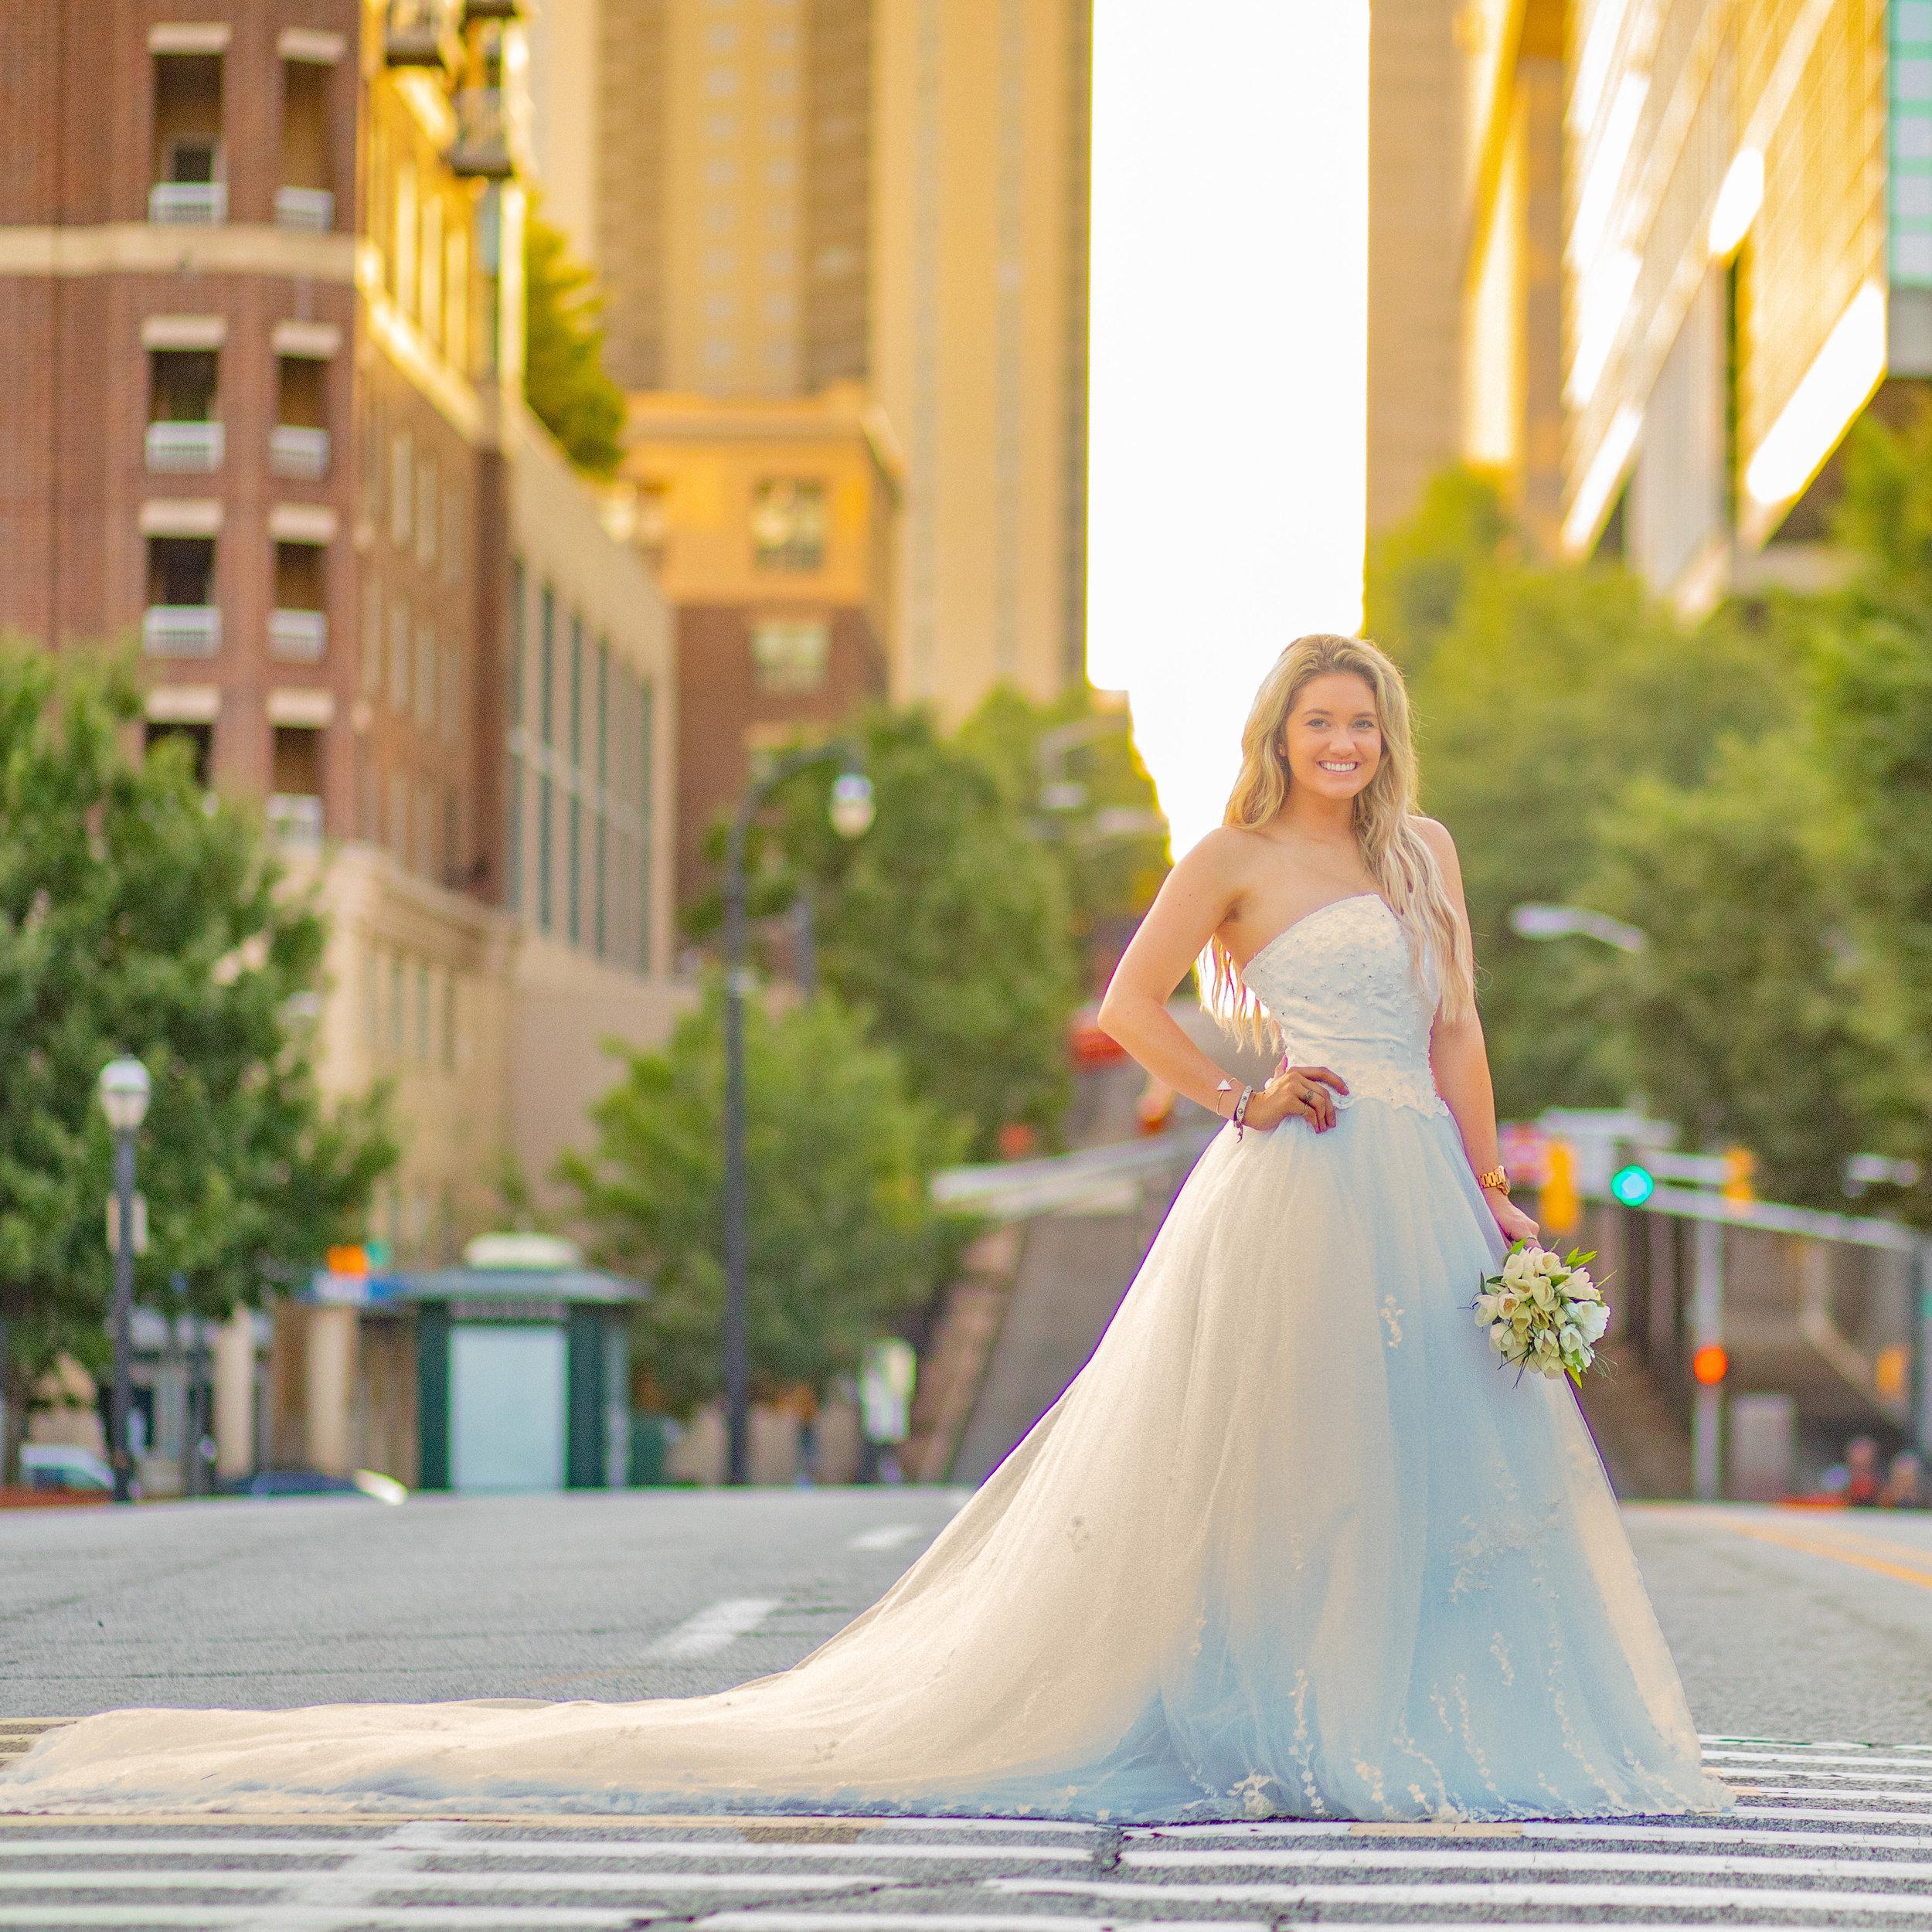 Shot by the Atlanta Wedding Photographers at AtlantaArtisticWeddings in Peachtree Street